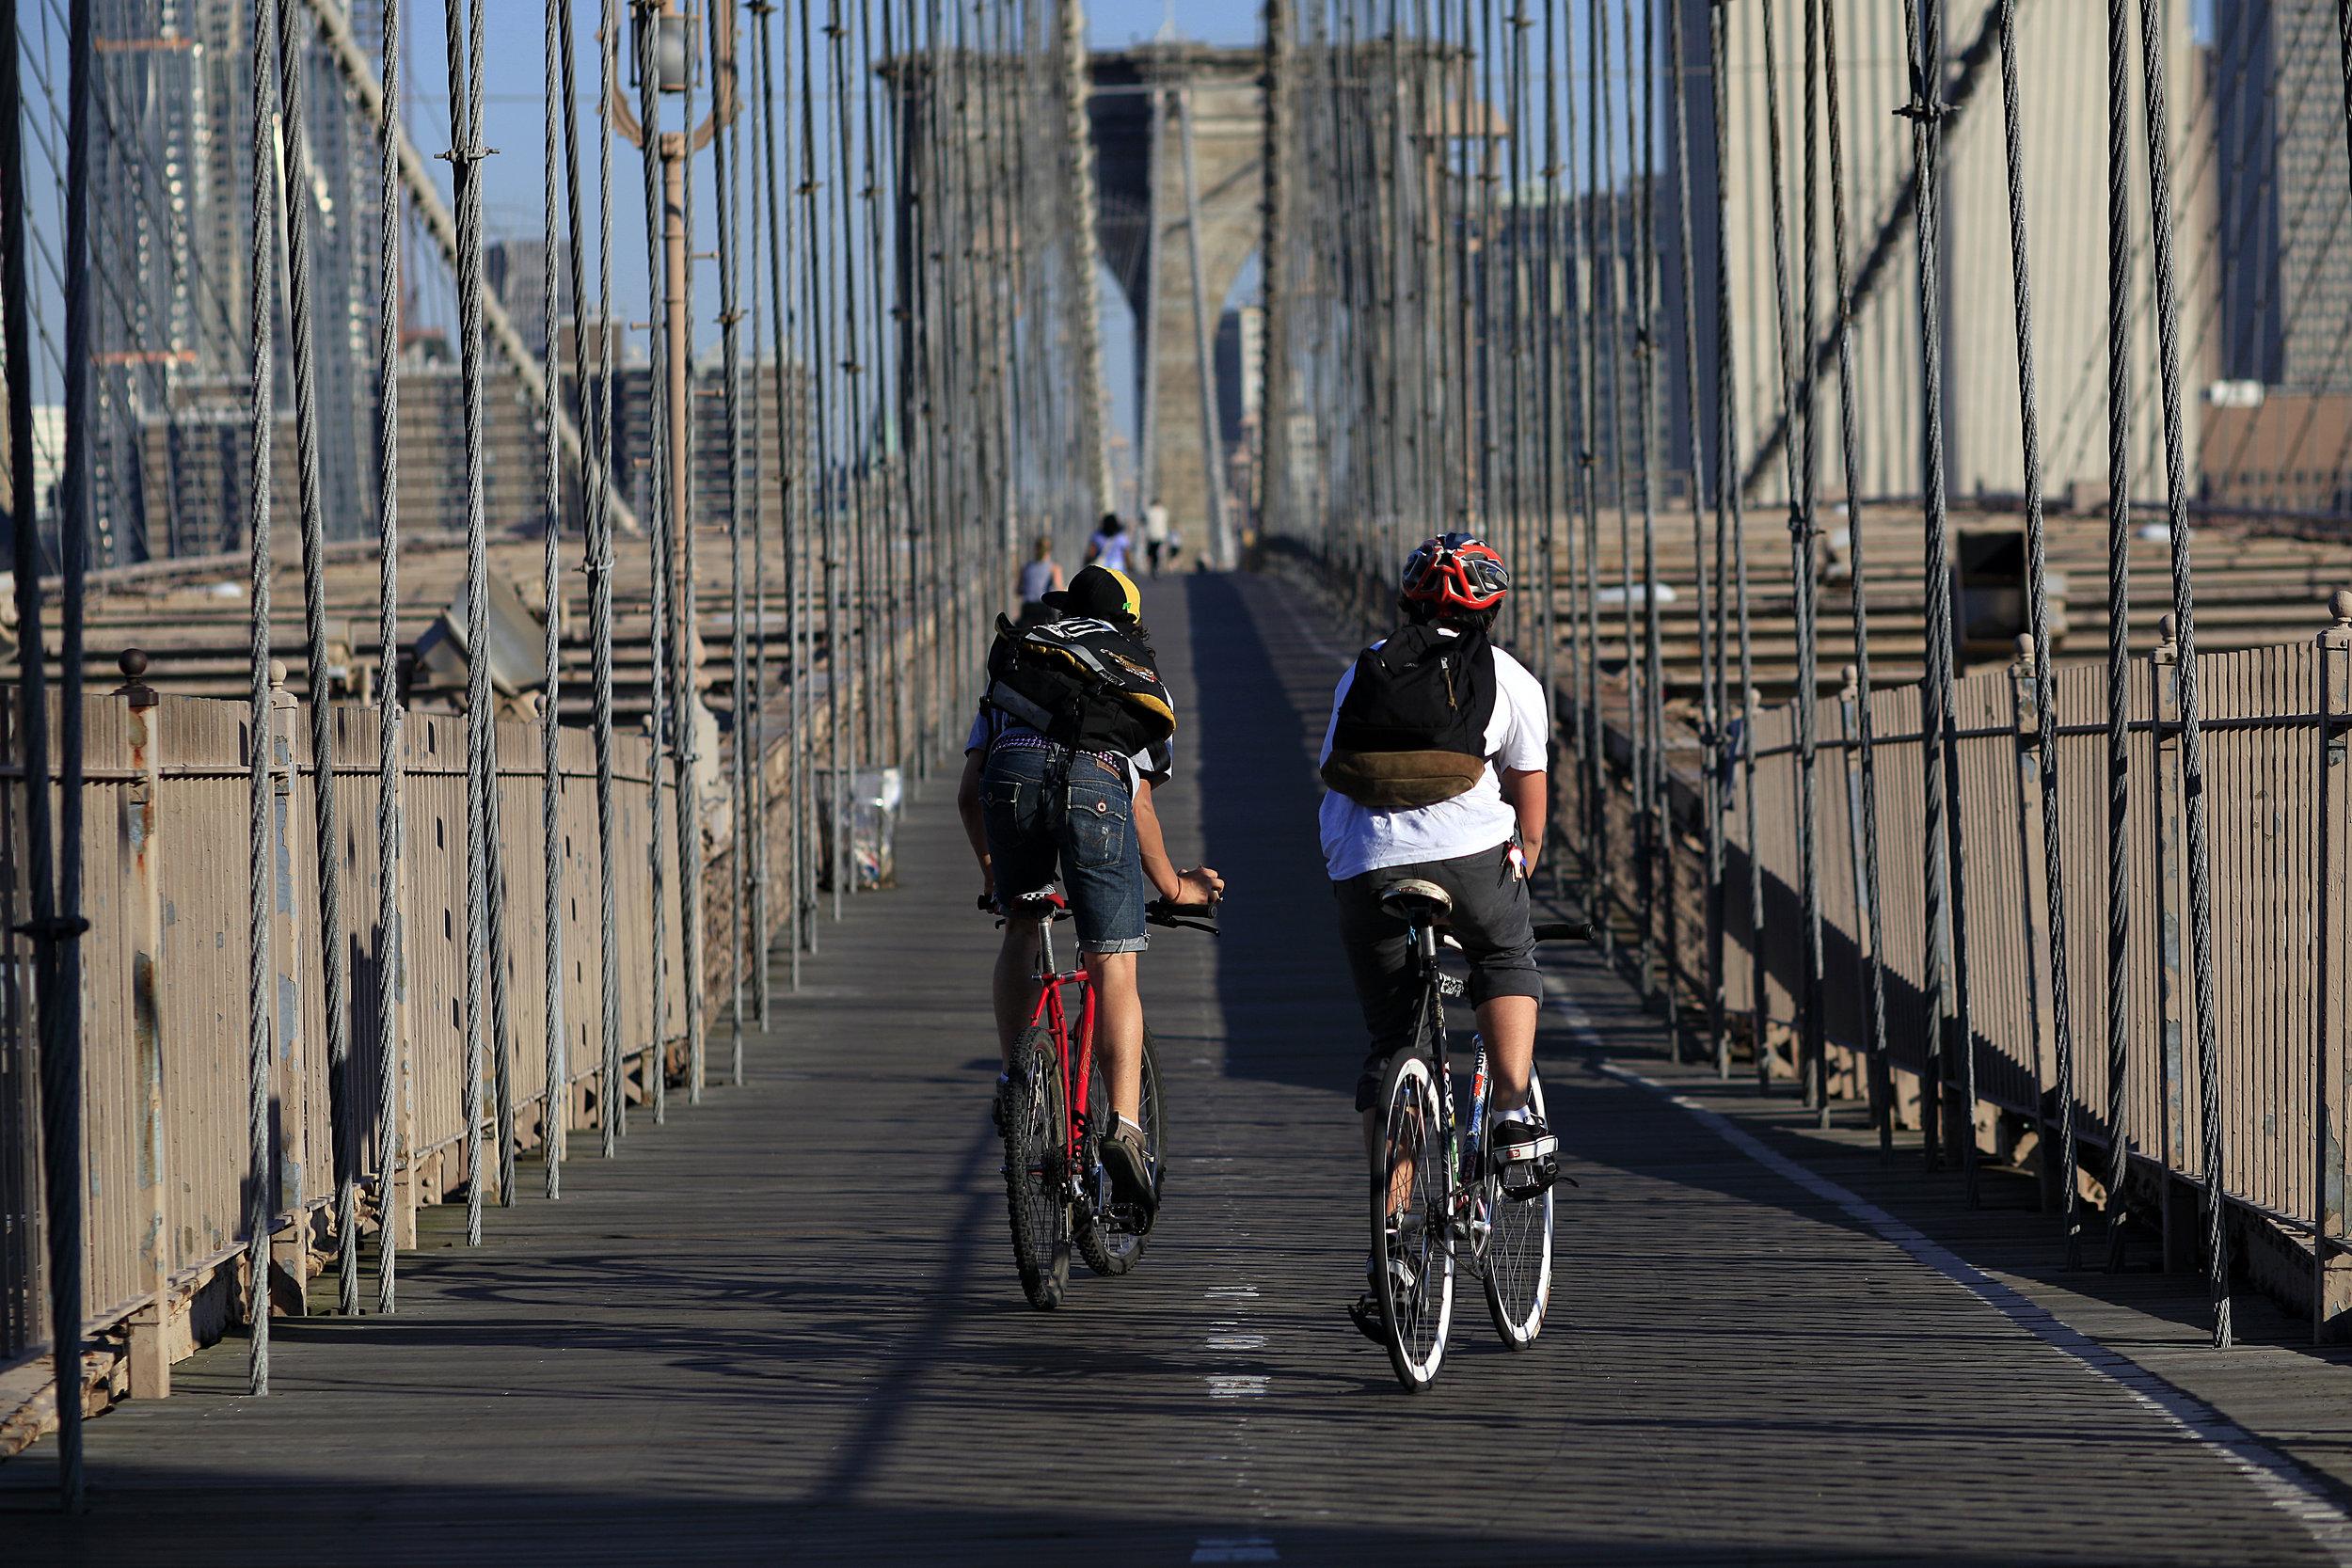 Cyclng on Brooklyn Bridge, NYC. Photo credit - NYC & Company, Joe Buglewicz.